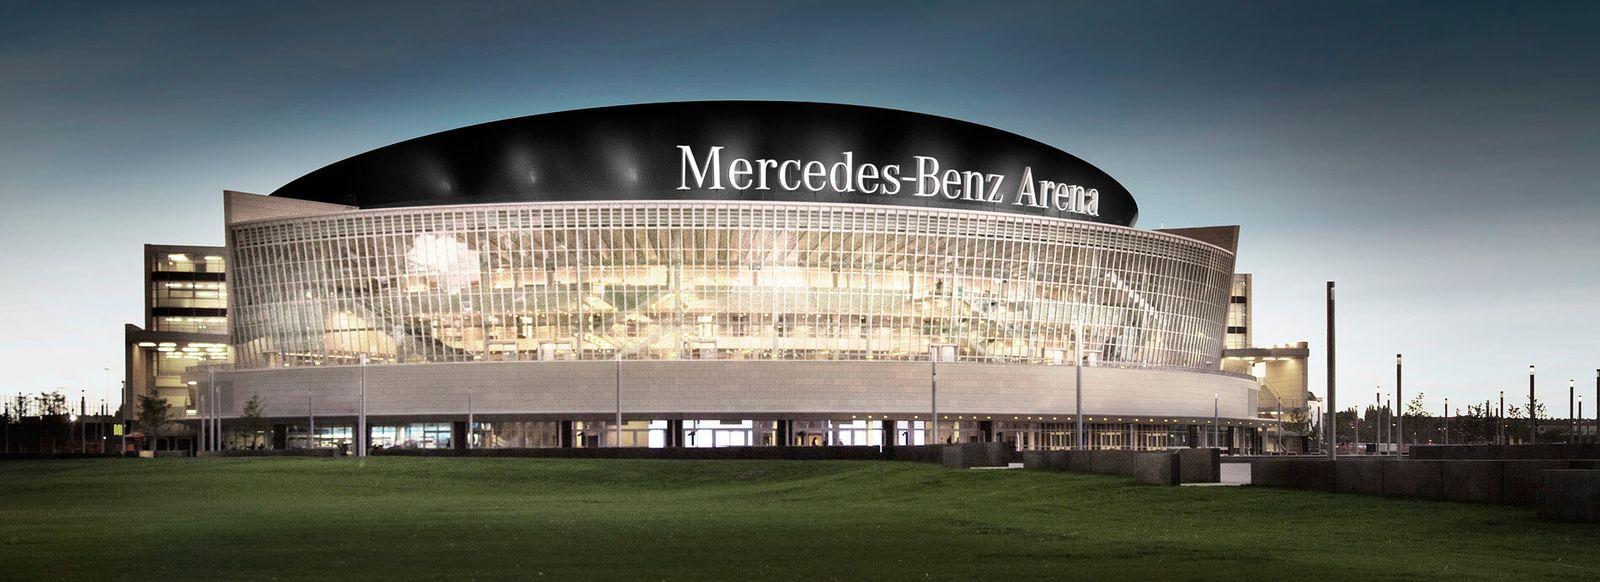 mercedes-benz arena - alba berlin basketballteam